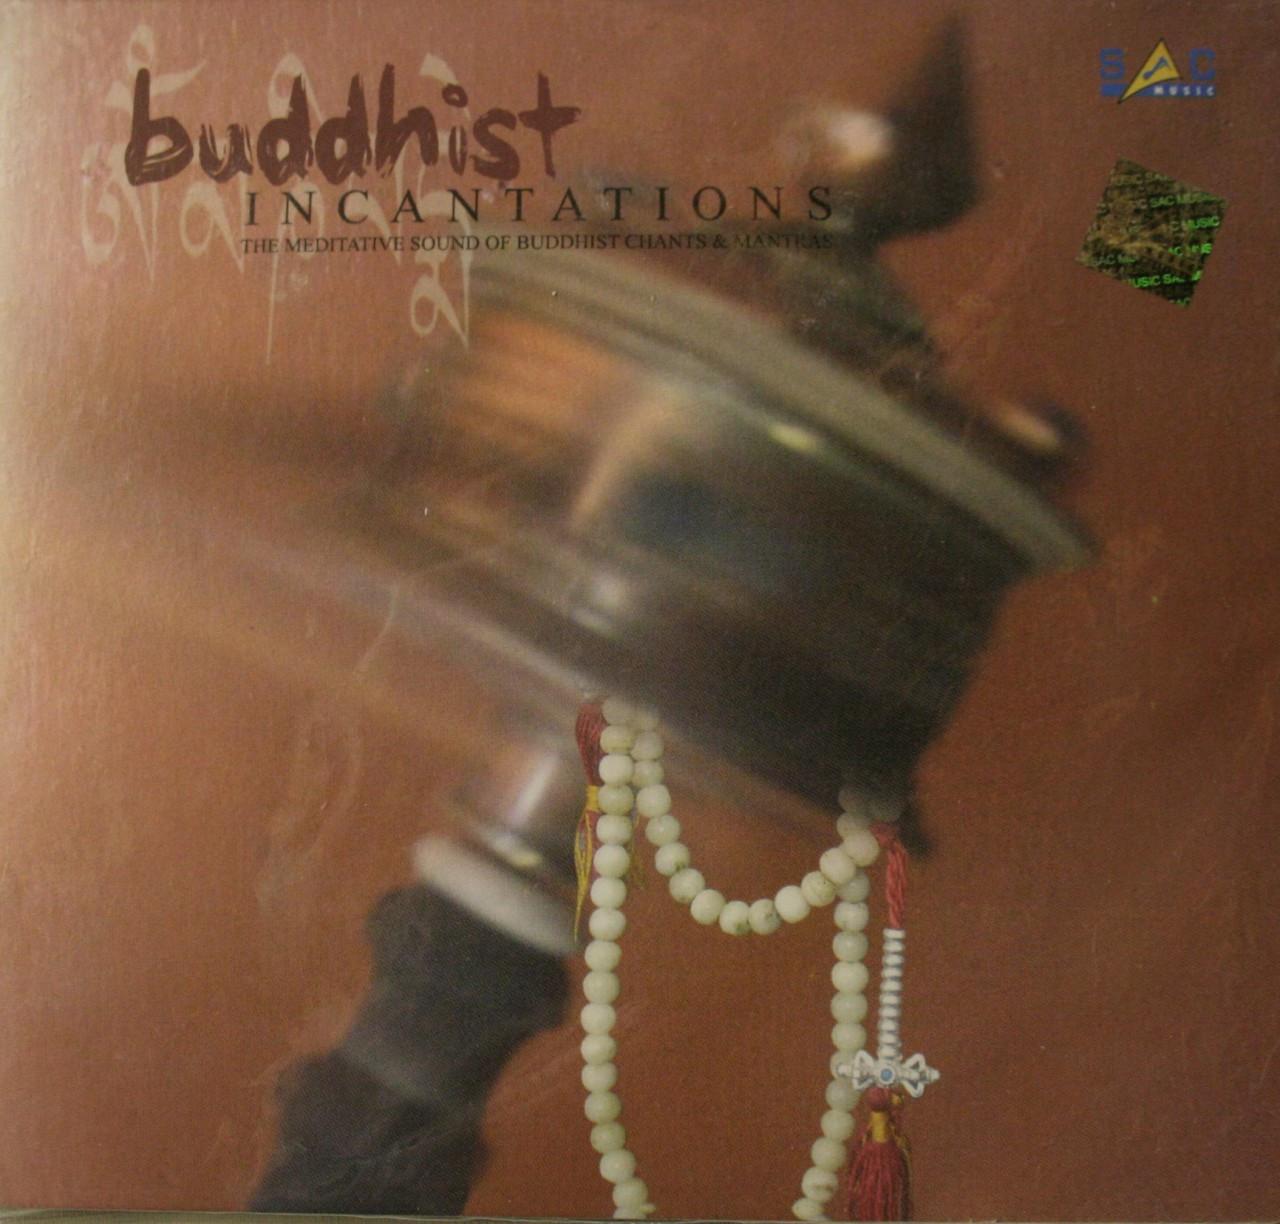 Buddhist Incantations: Buddhist Chants and Mantras